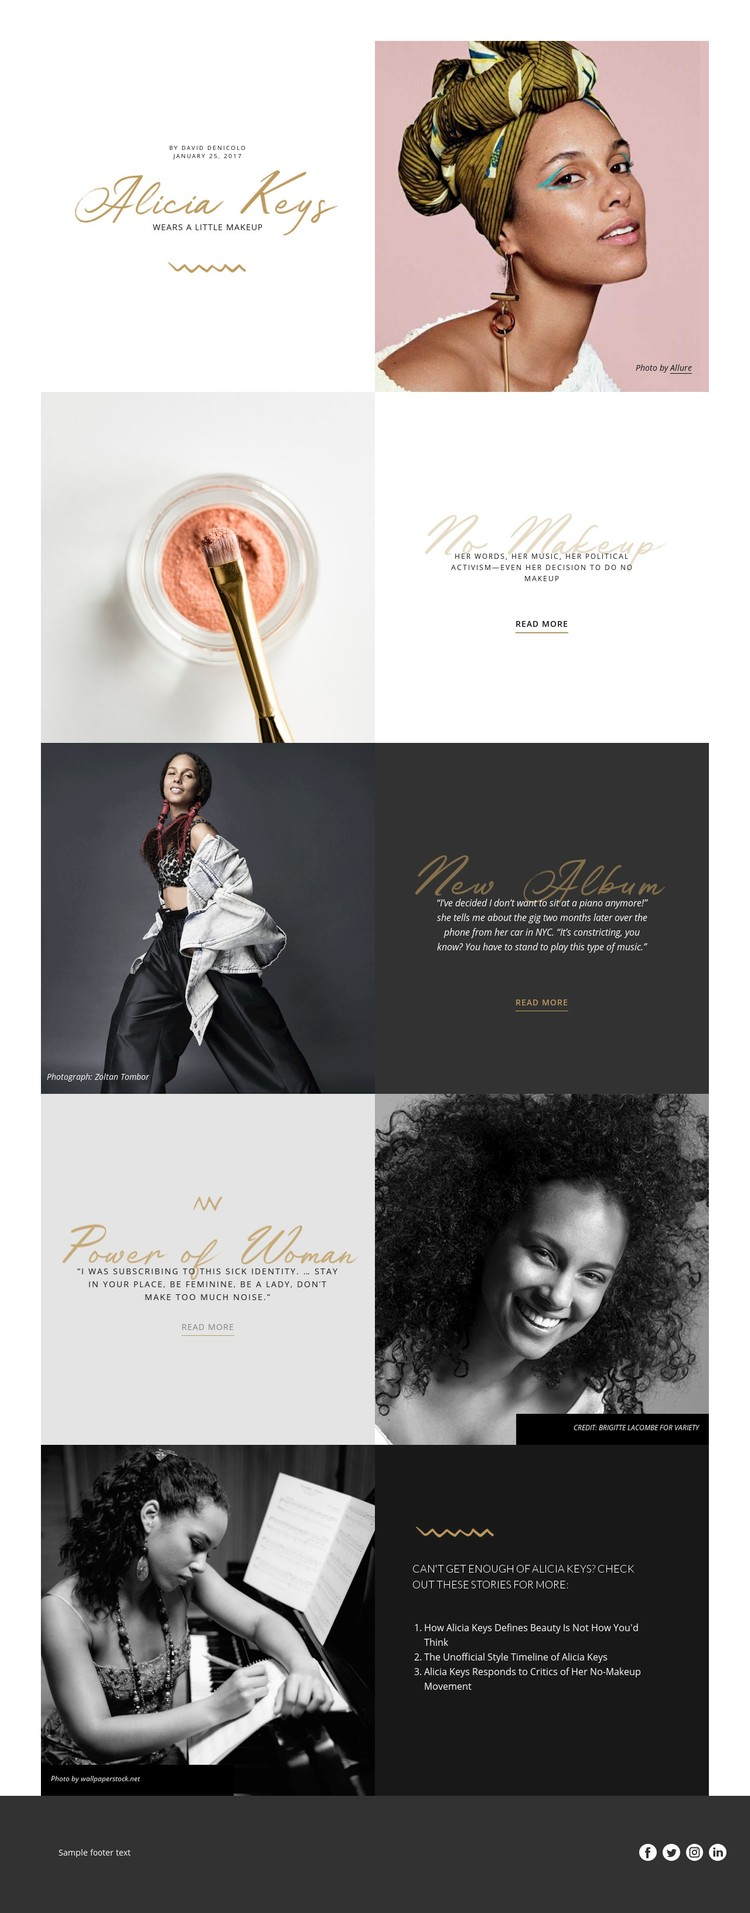 Alicia Keys Website Creator